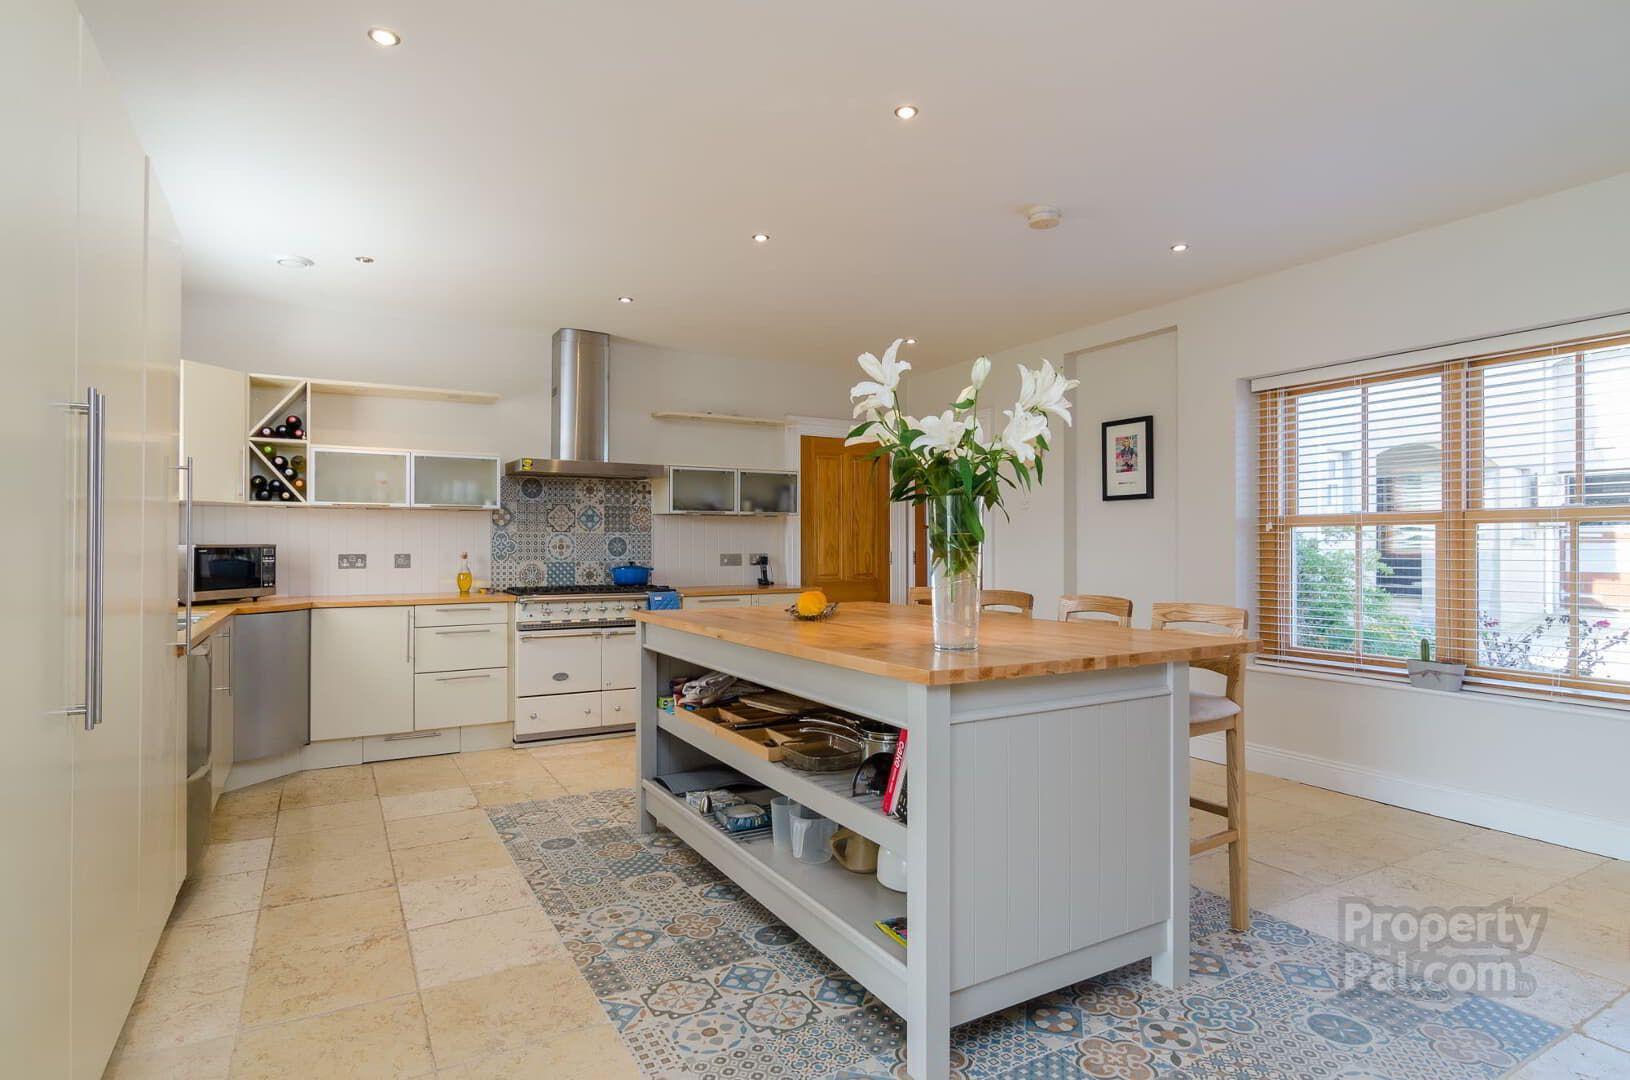 84A Ballystockart Road, Comber kitchen Kitchen, Home